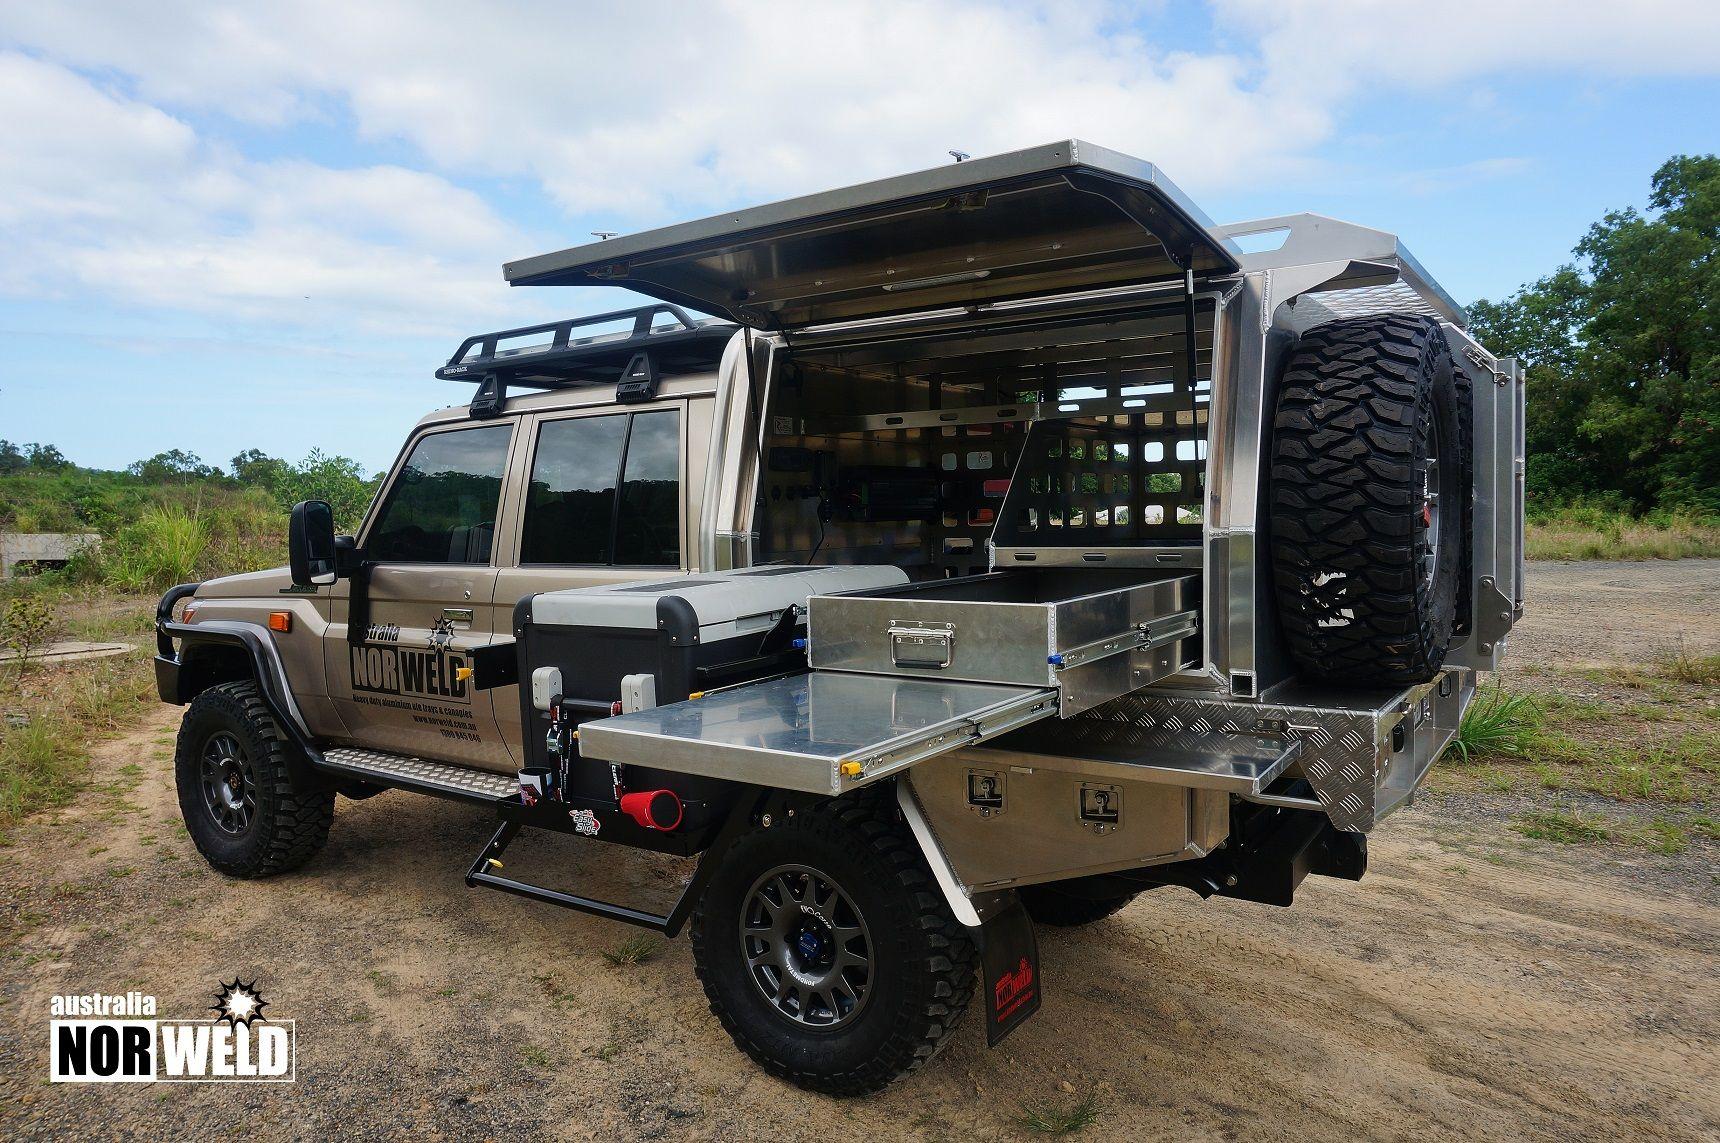 Toyota Landcruiser Aluminium Canopy Camping